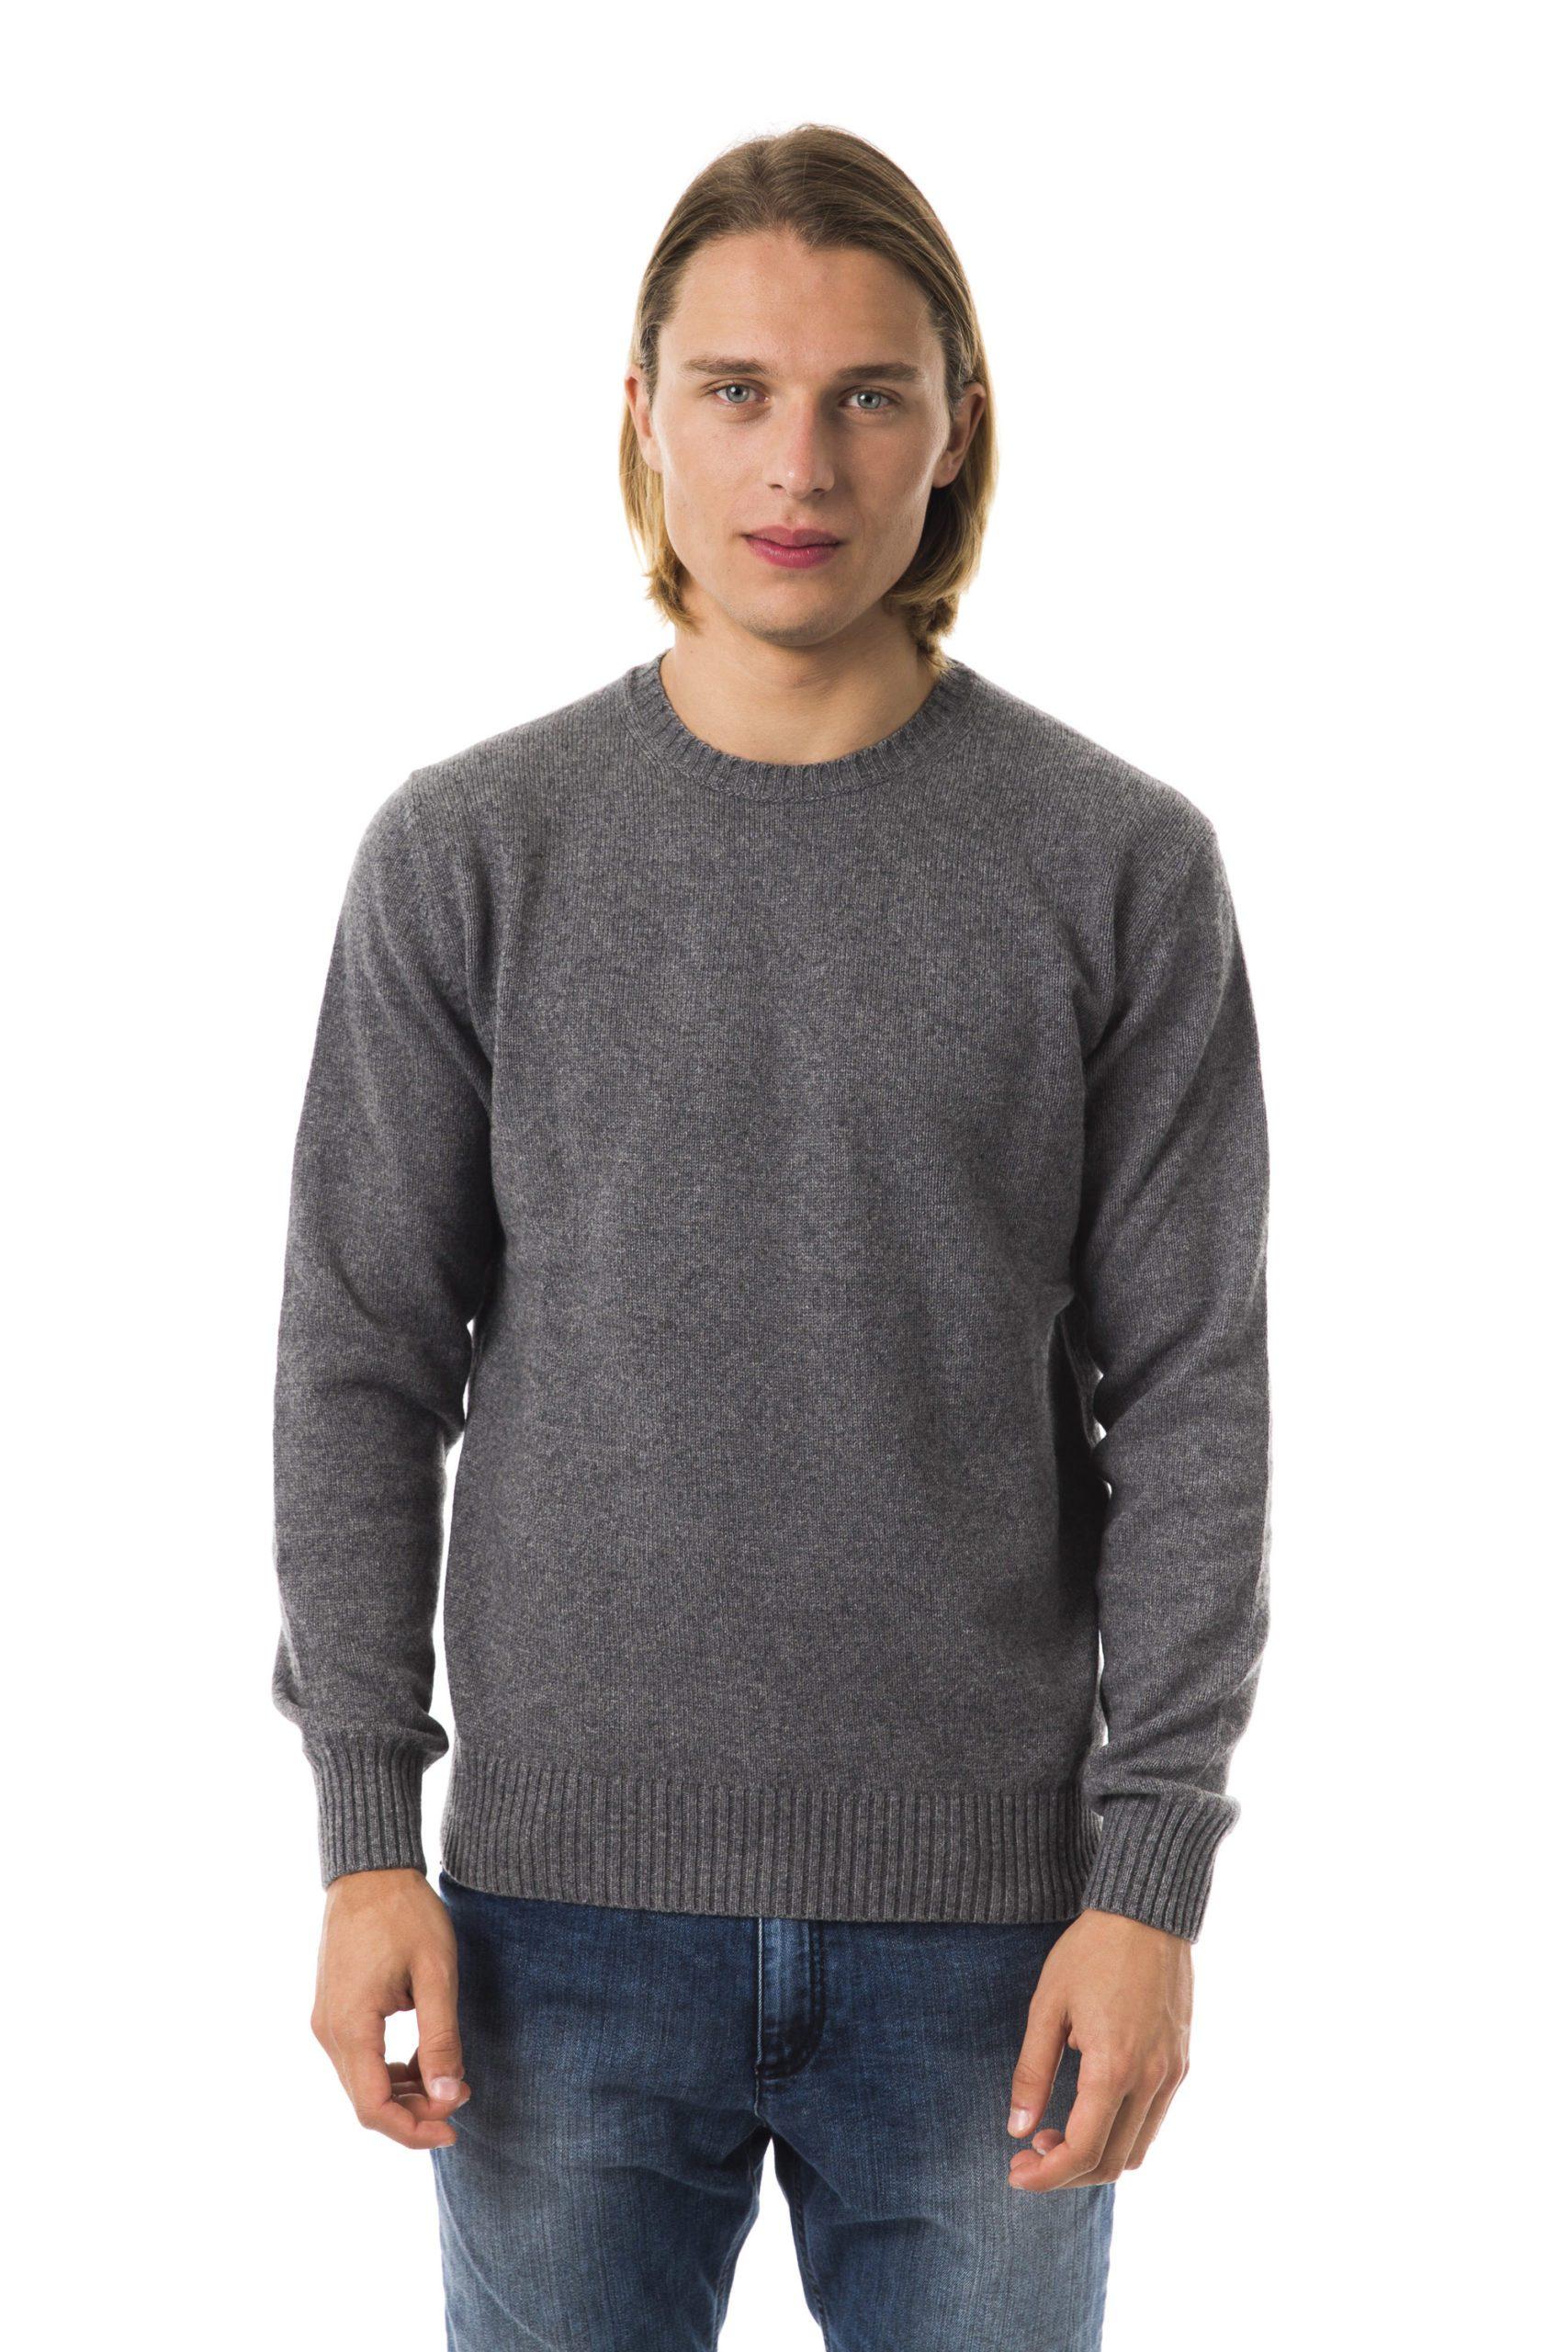 Uominitaliani Men's Cenere Sweater Gray UO816431 - M